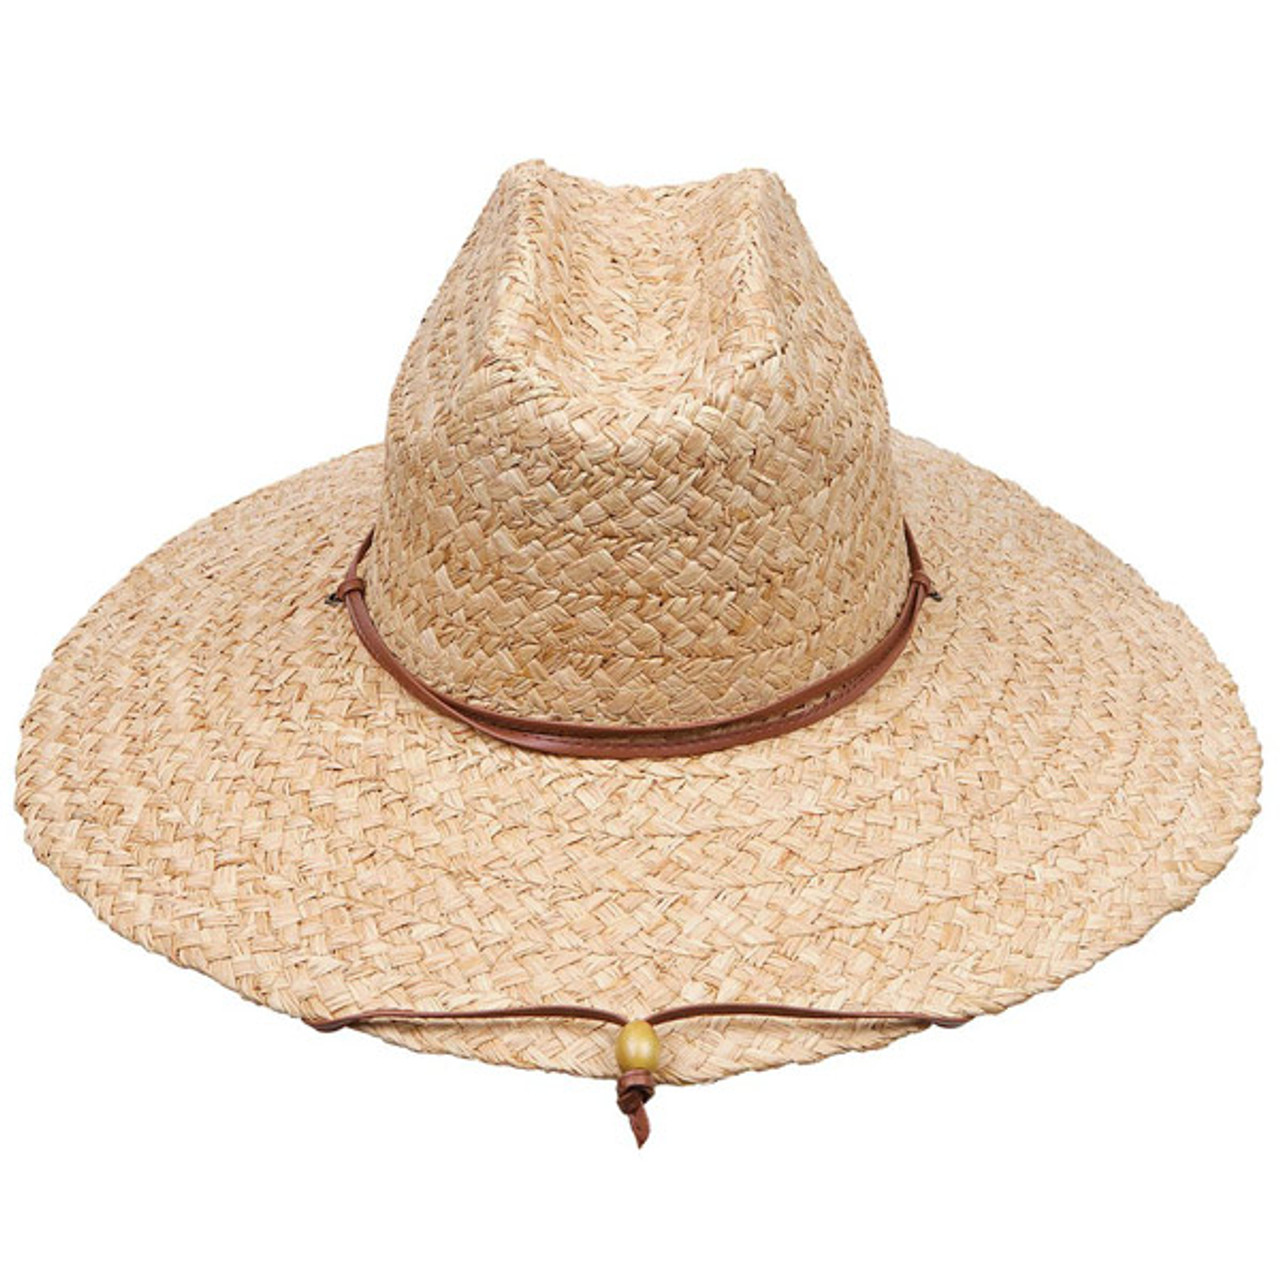 6891081a8 Kenny K - Straw Lifeguard Hat